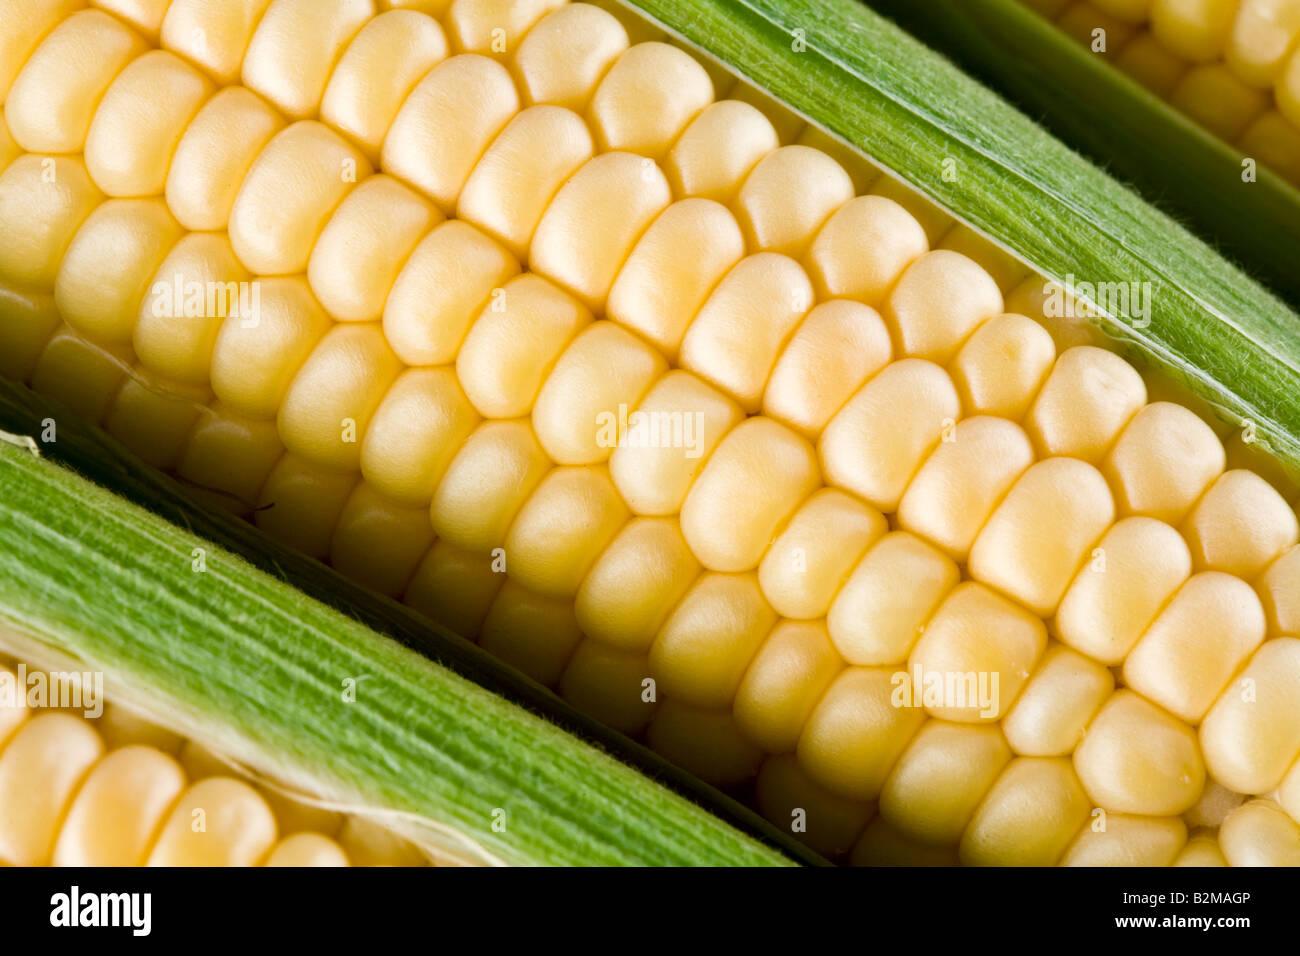 maize - Stock Image